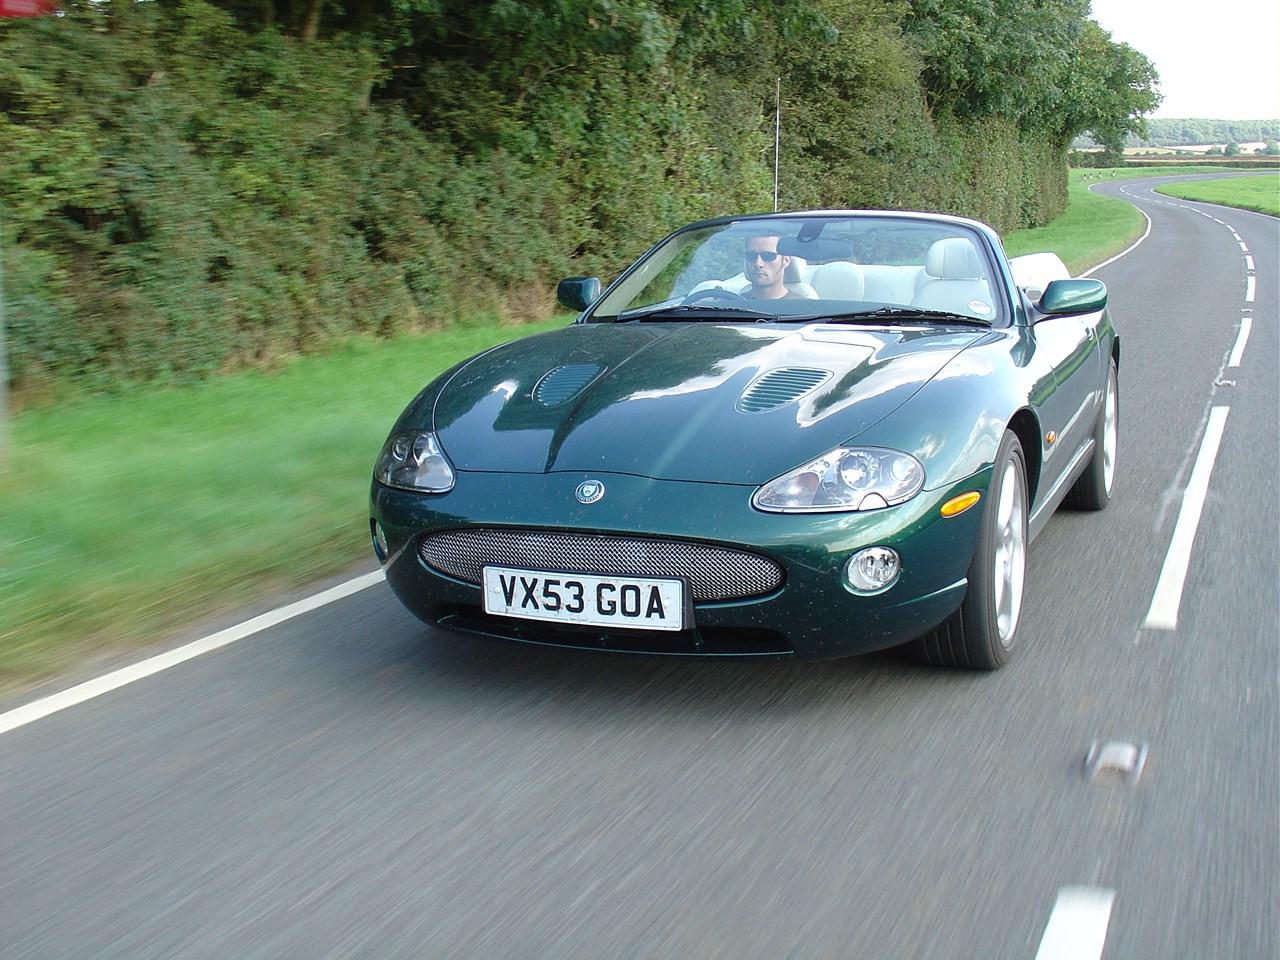 Used Jaguar XK8 Convertible (1996 - 2005) Review   Parkers